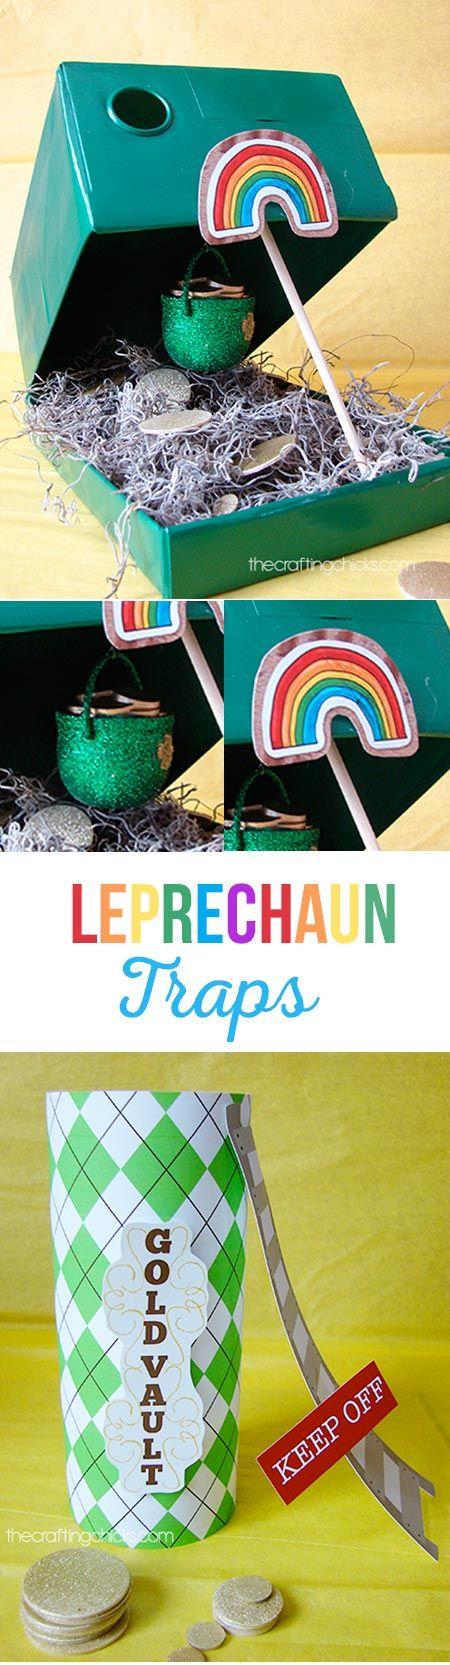 Make a Leprechaun Trap to catch a mischievous little leprechaun this St Patricks's Day. via @craftingchicks